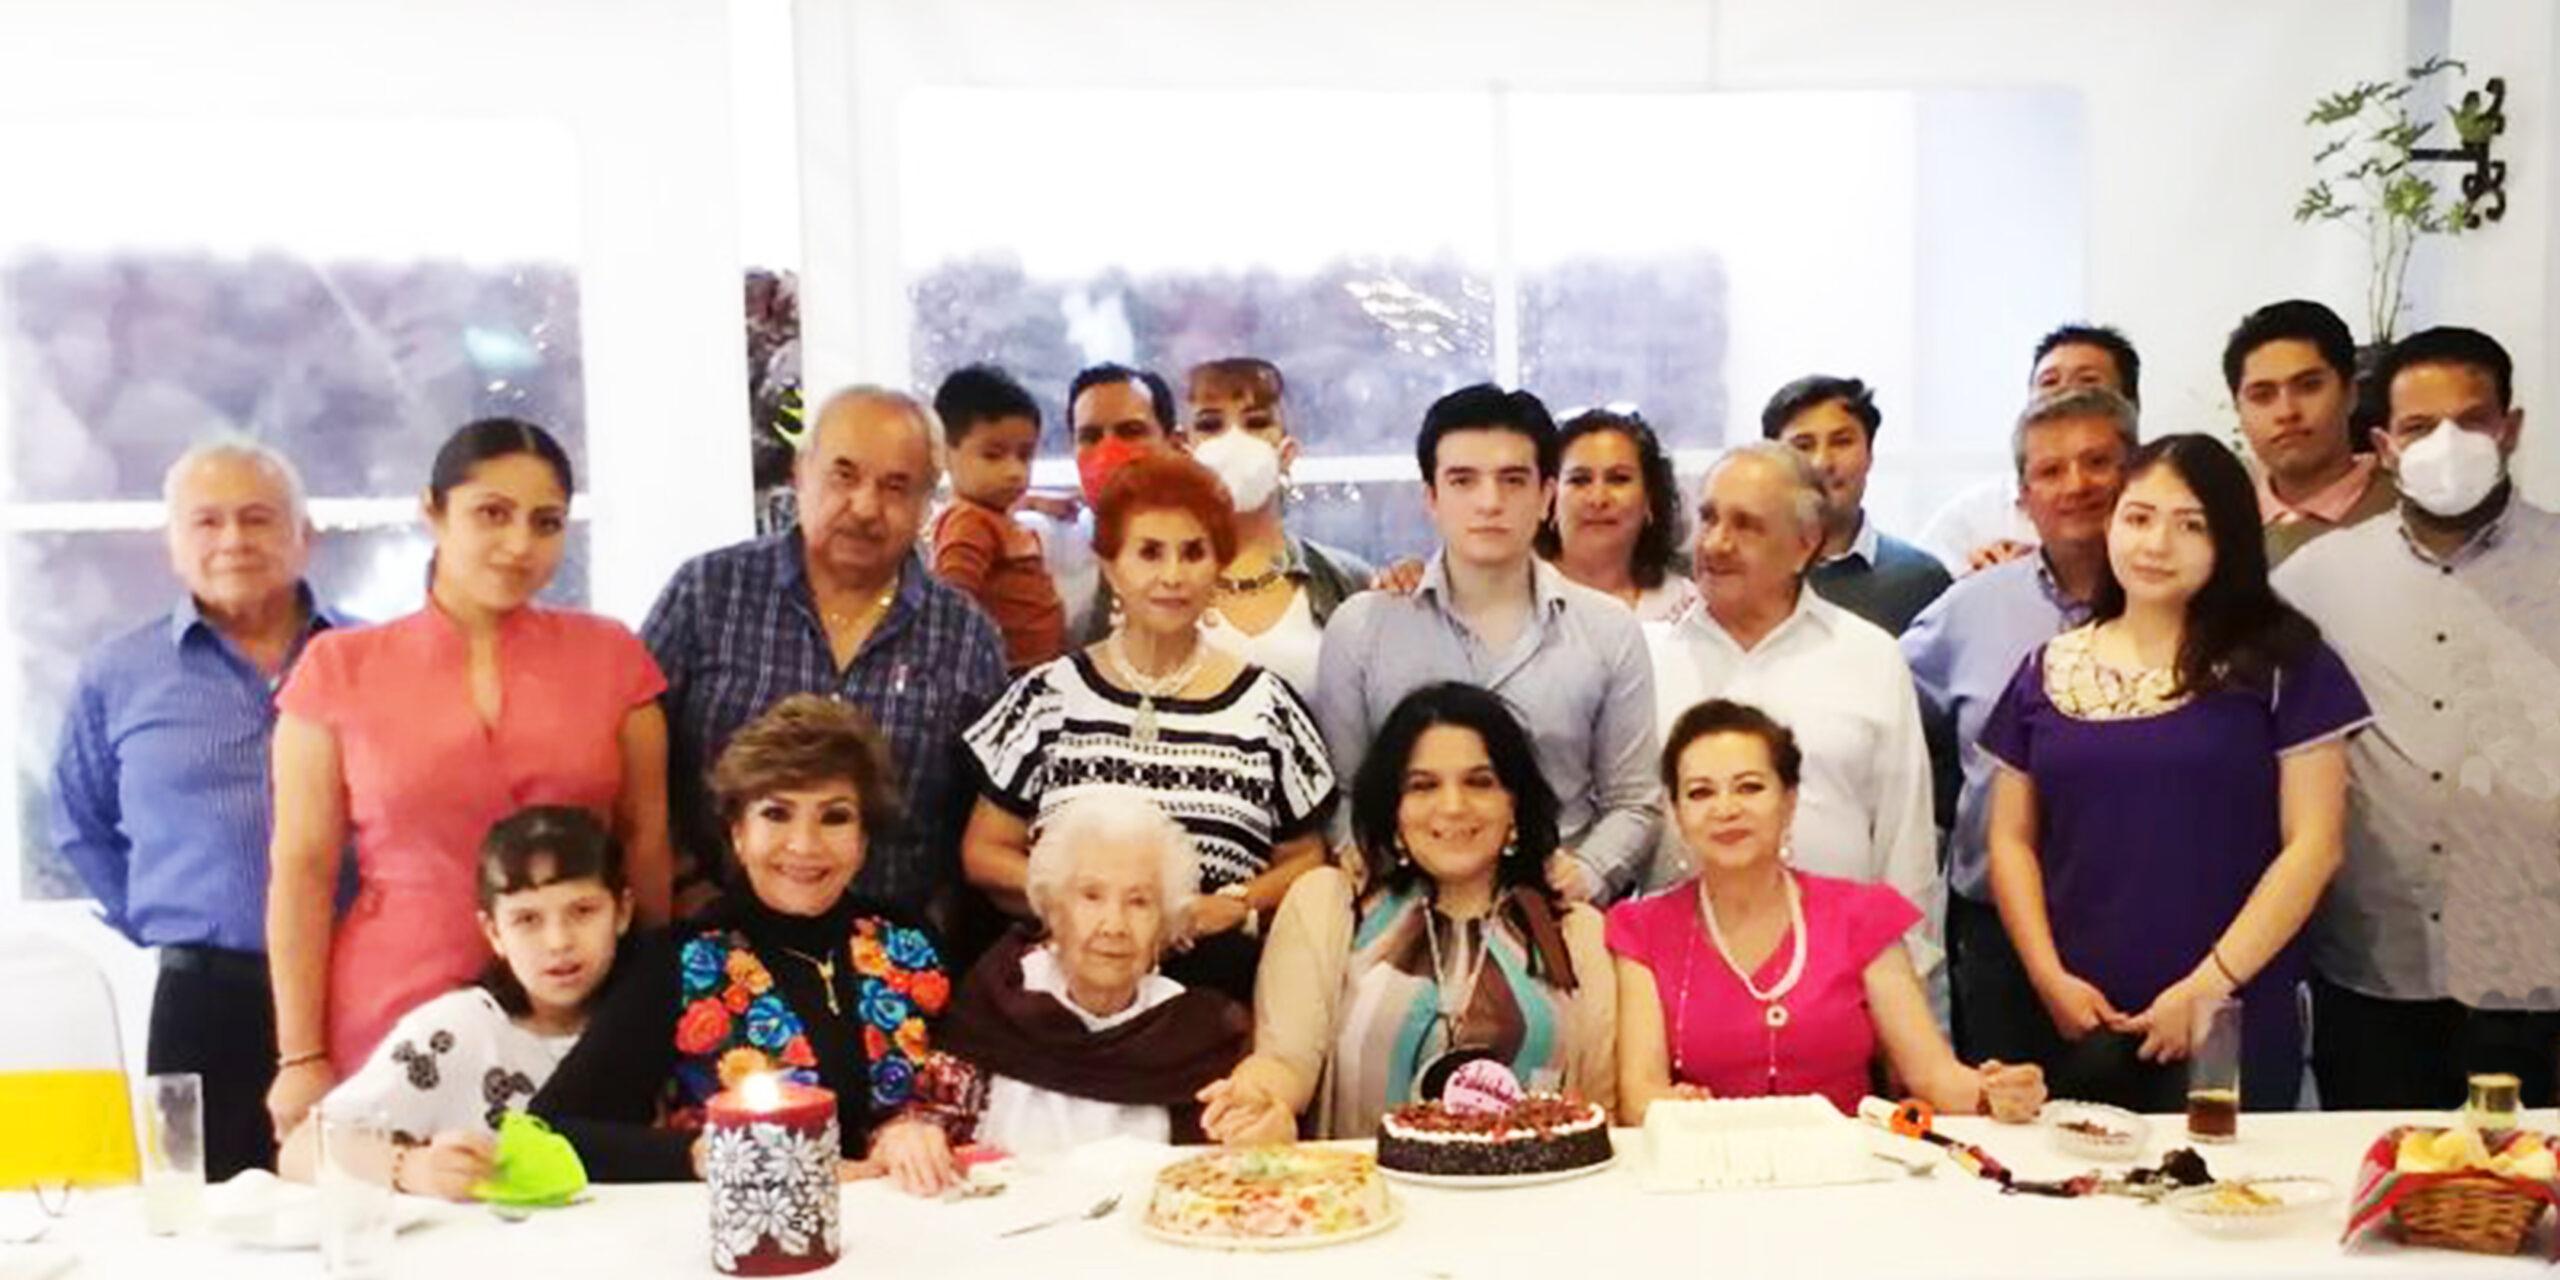 Celebran en familia a Mimis | El Imparcial de Oaxaca